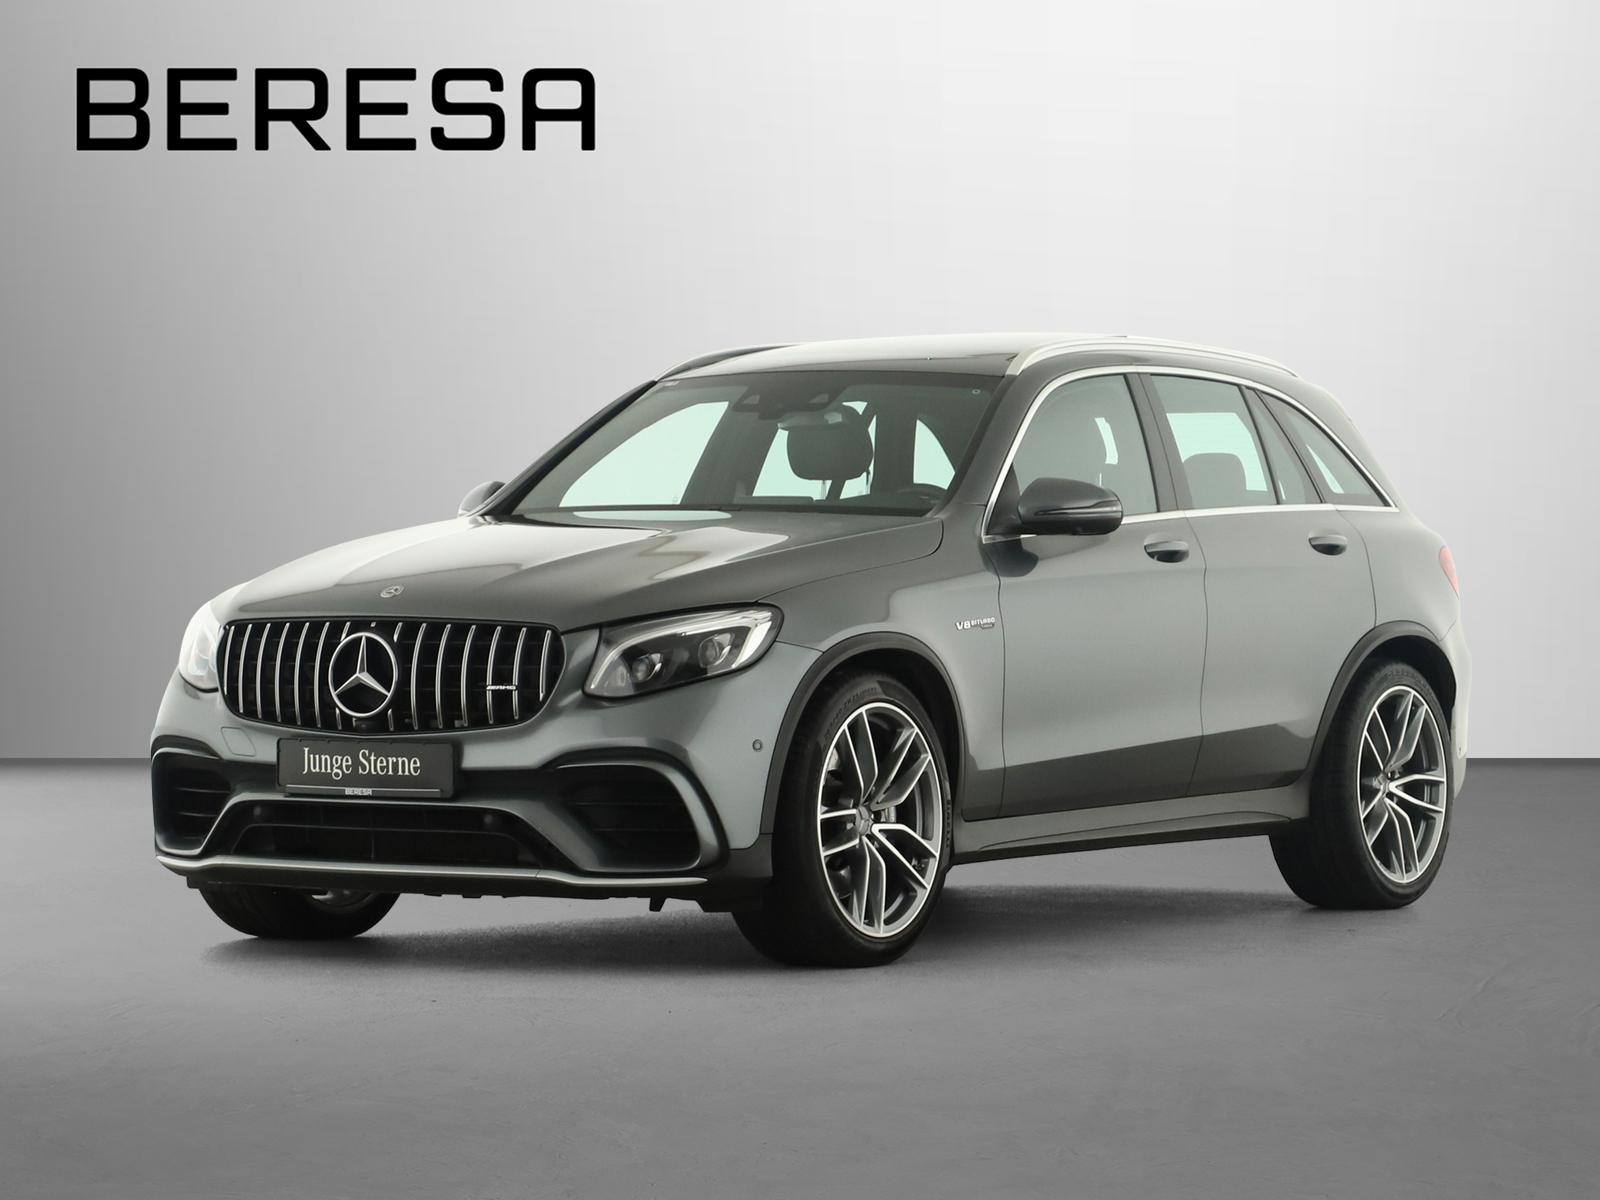 Mercedes-Benz GLC 63 AMG 4M+ Burmester Comand Pano.-Dach 360°, Jahr 2018, Benzin